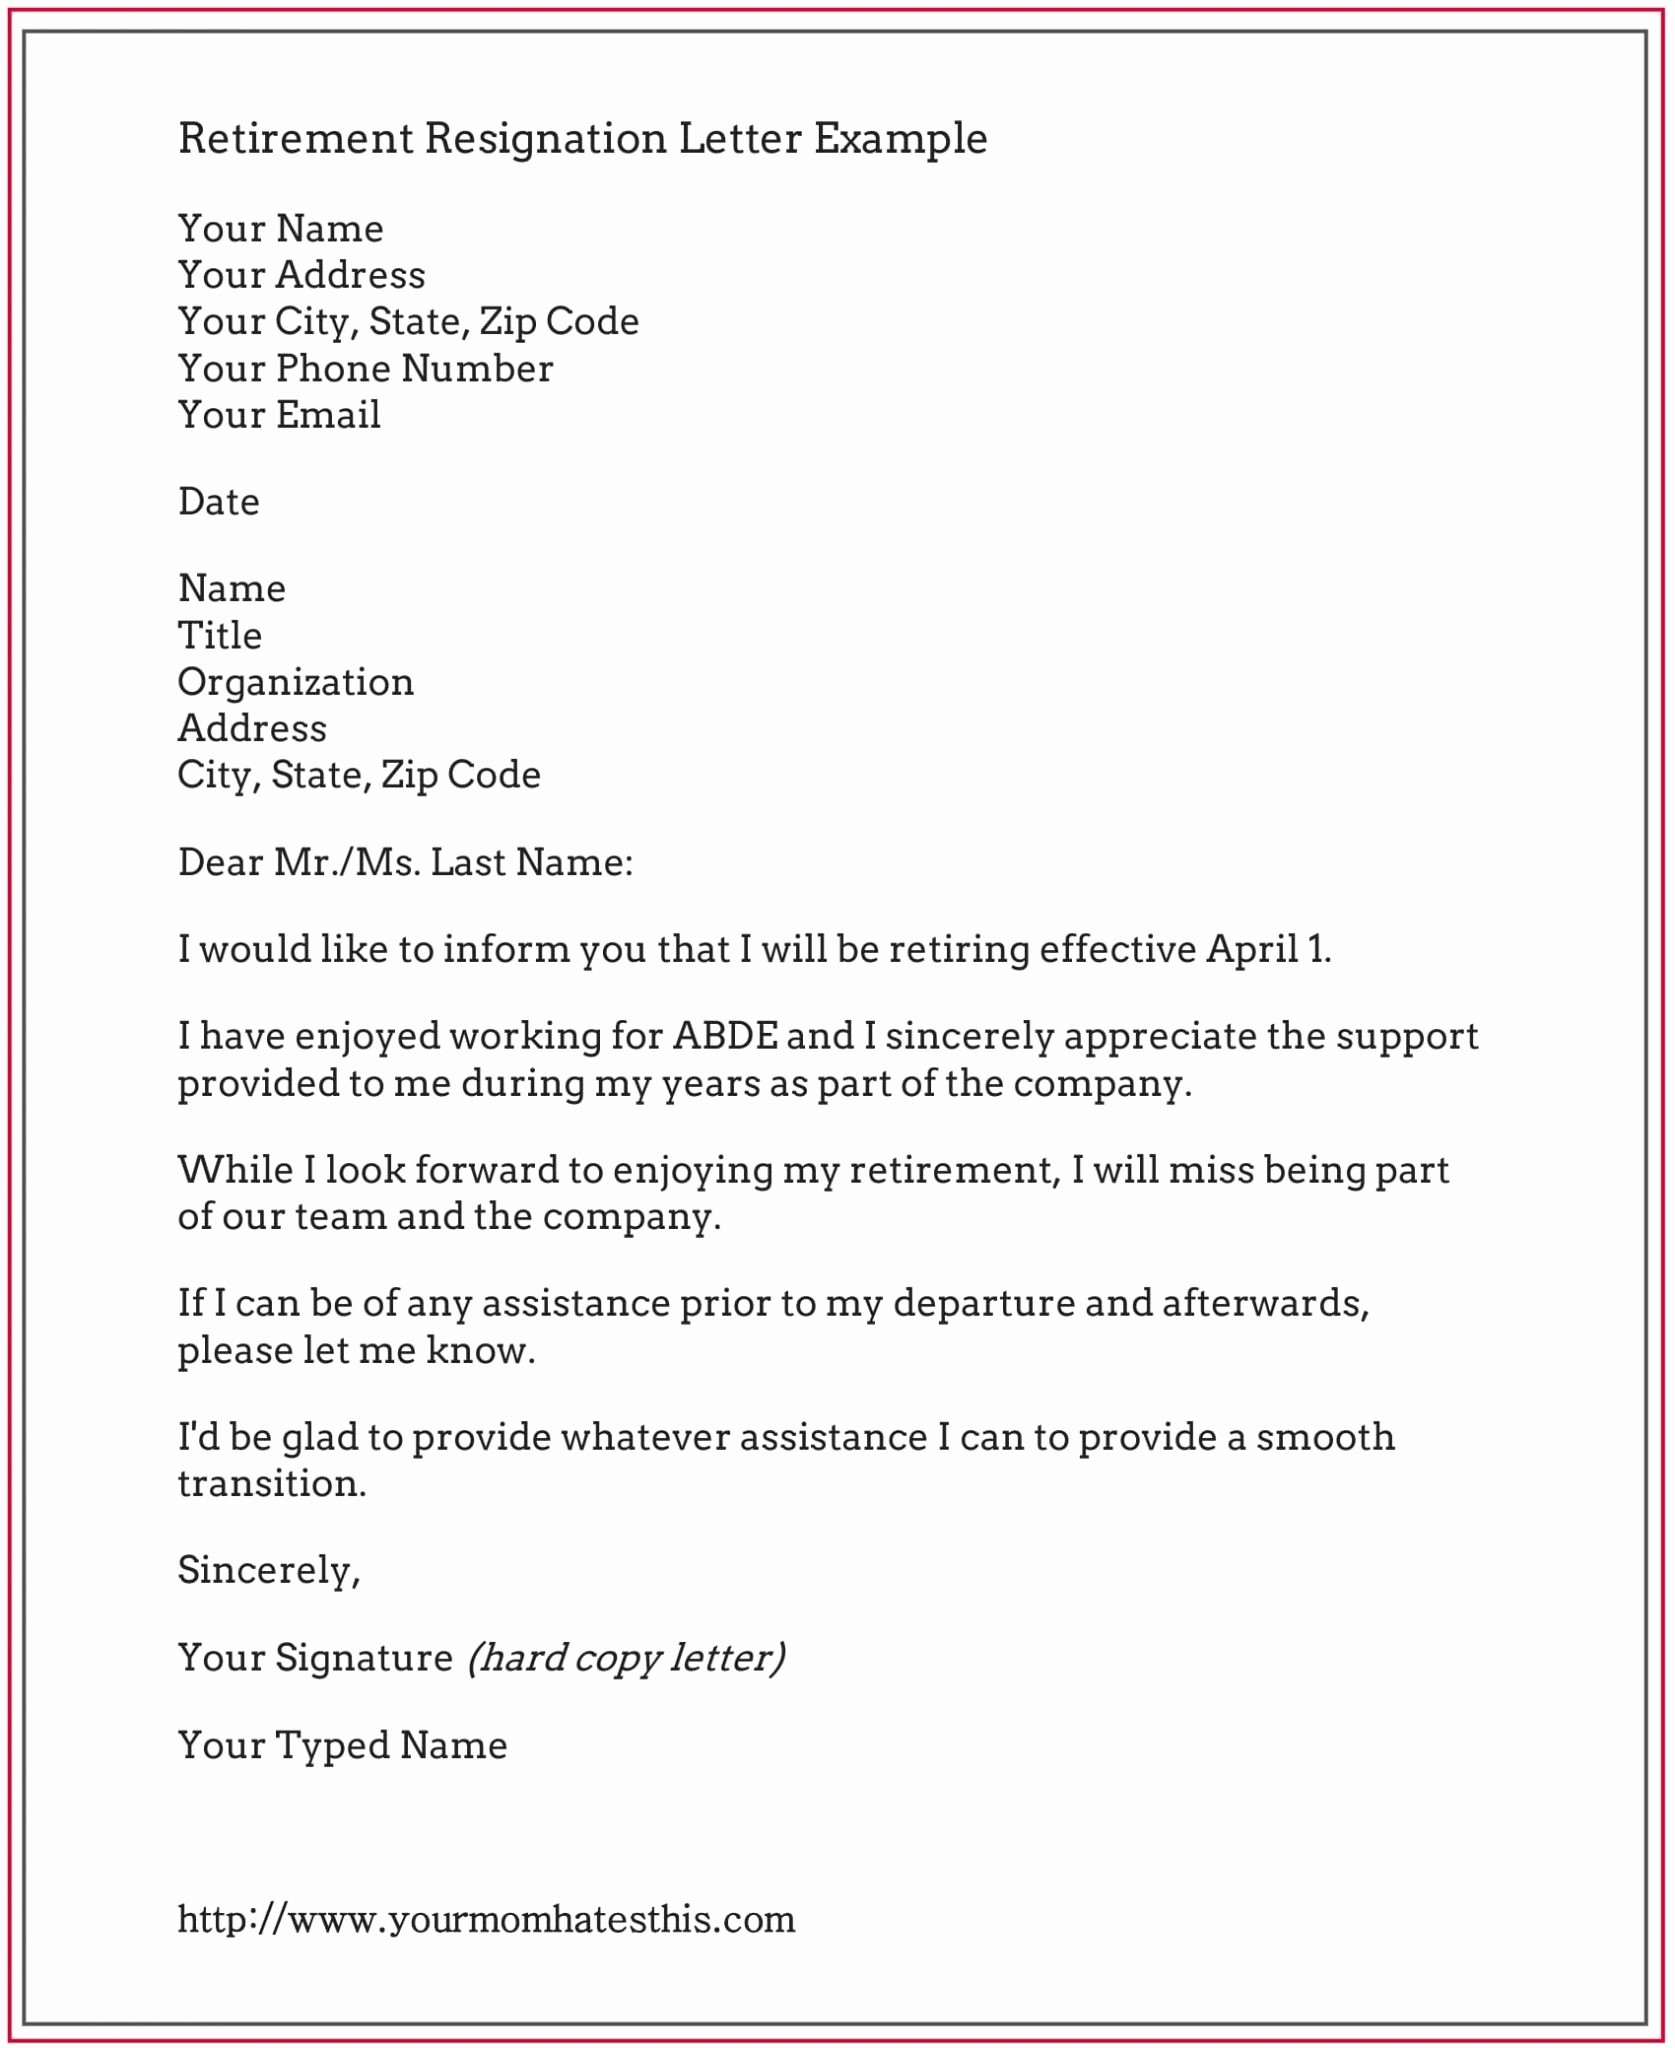 Letter Of Resignation Retirement Example Luxury Retirement Resignation Letter Example